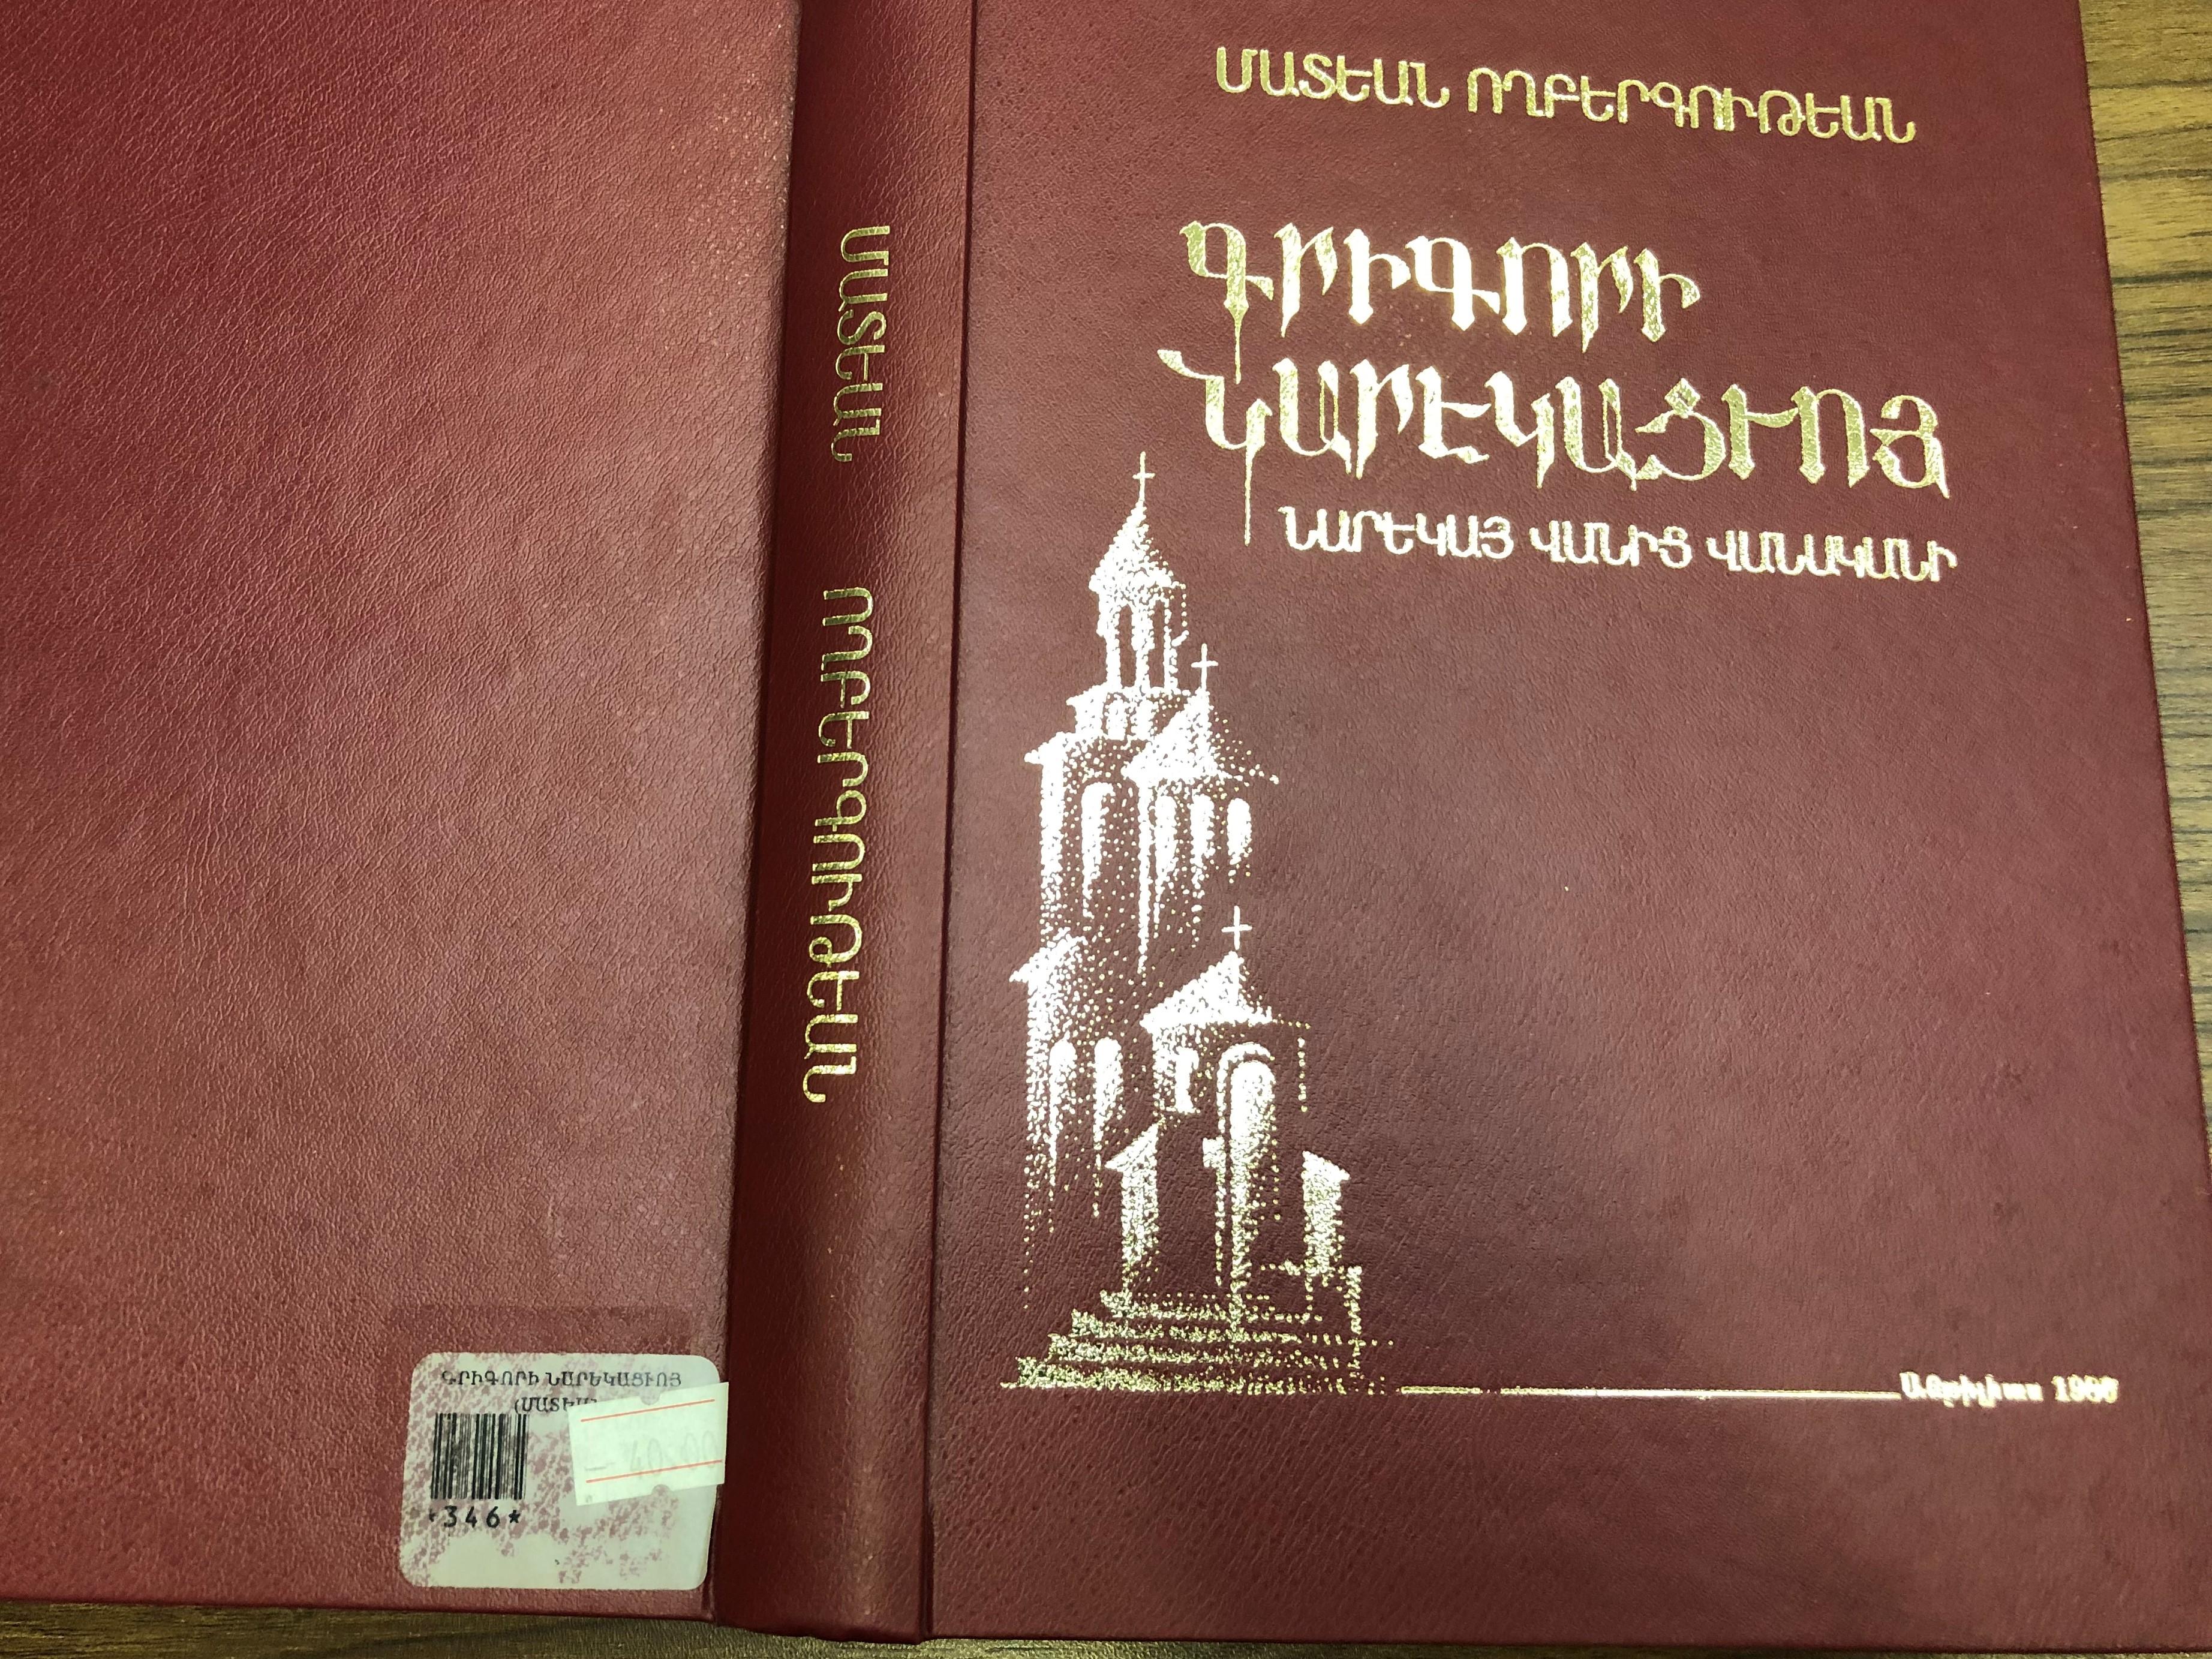 armenian-christian-prayer-book-daily-prayers-daily-devotionals-readings-hardcover-14-.jpg